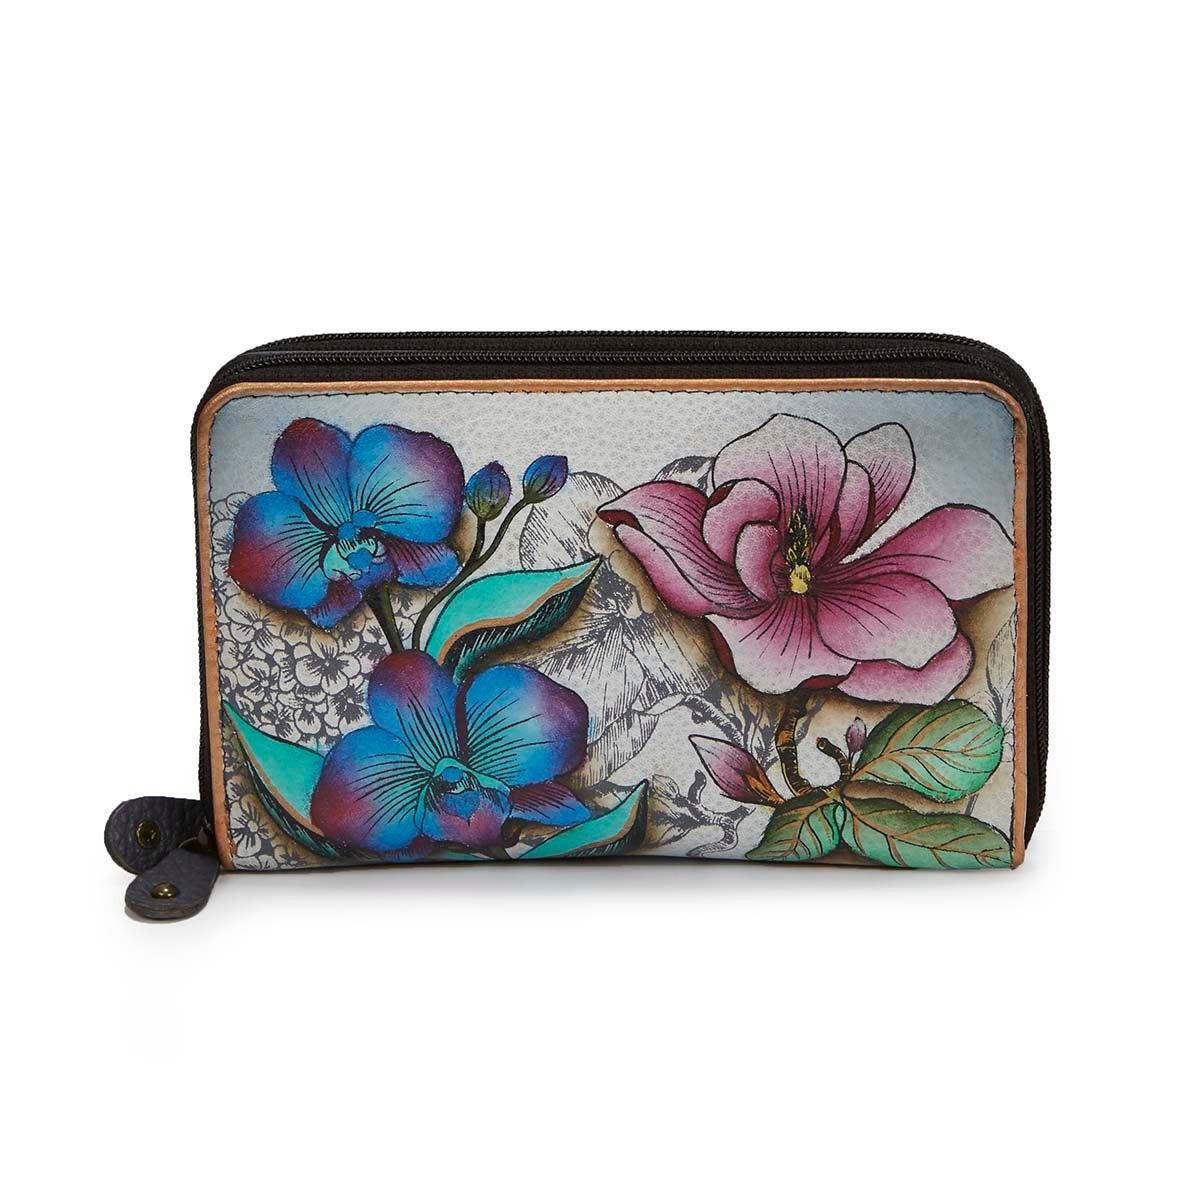 Printed lthr Floral Fantasy wallet